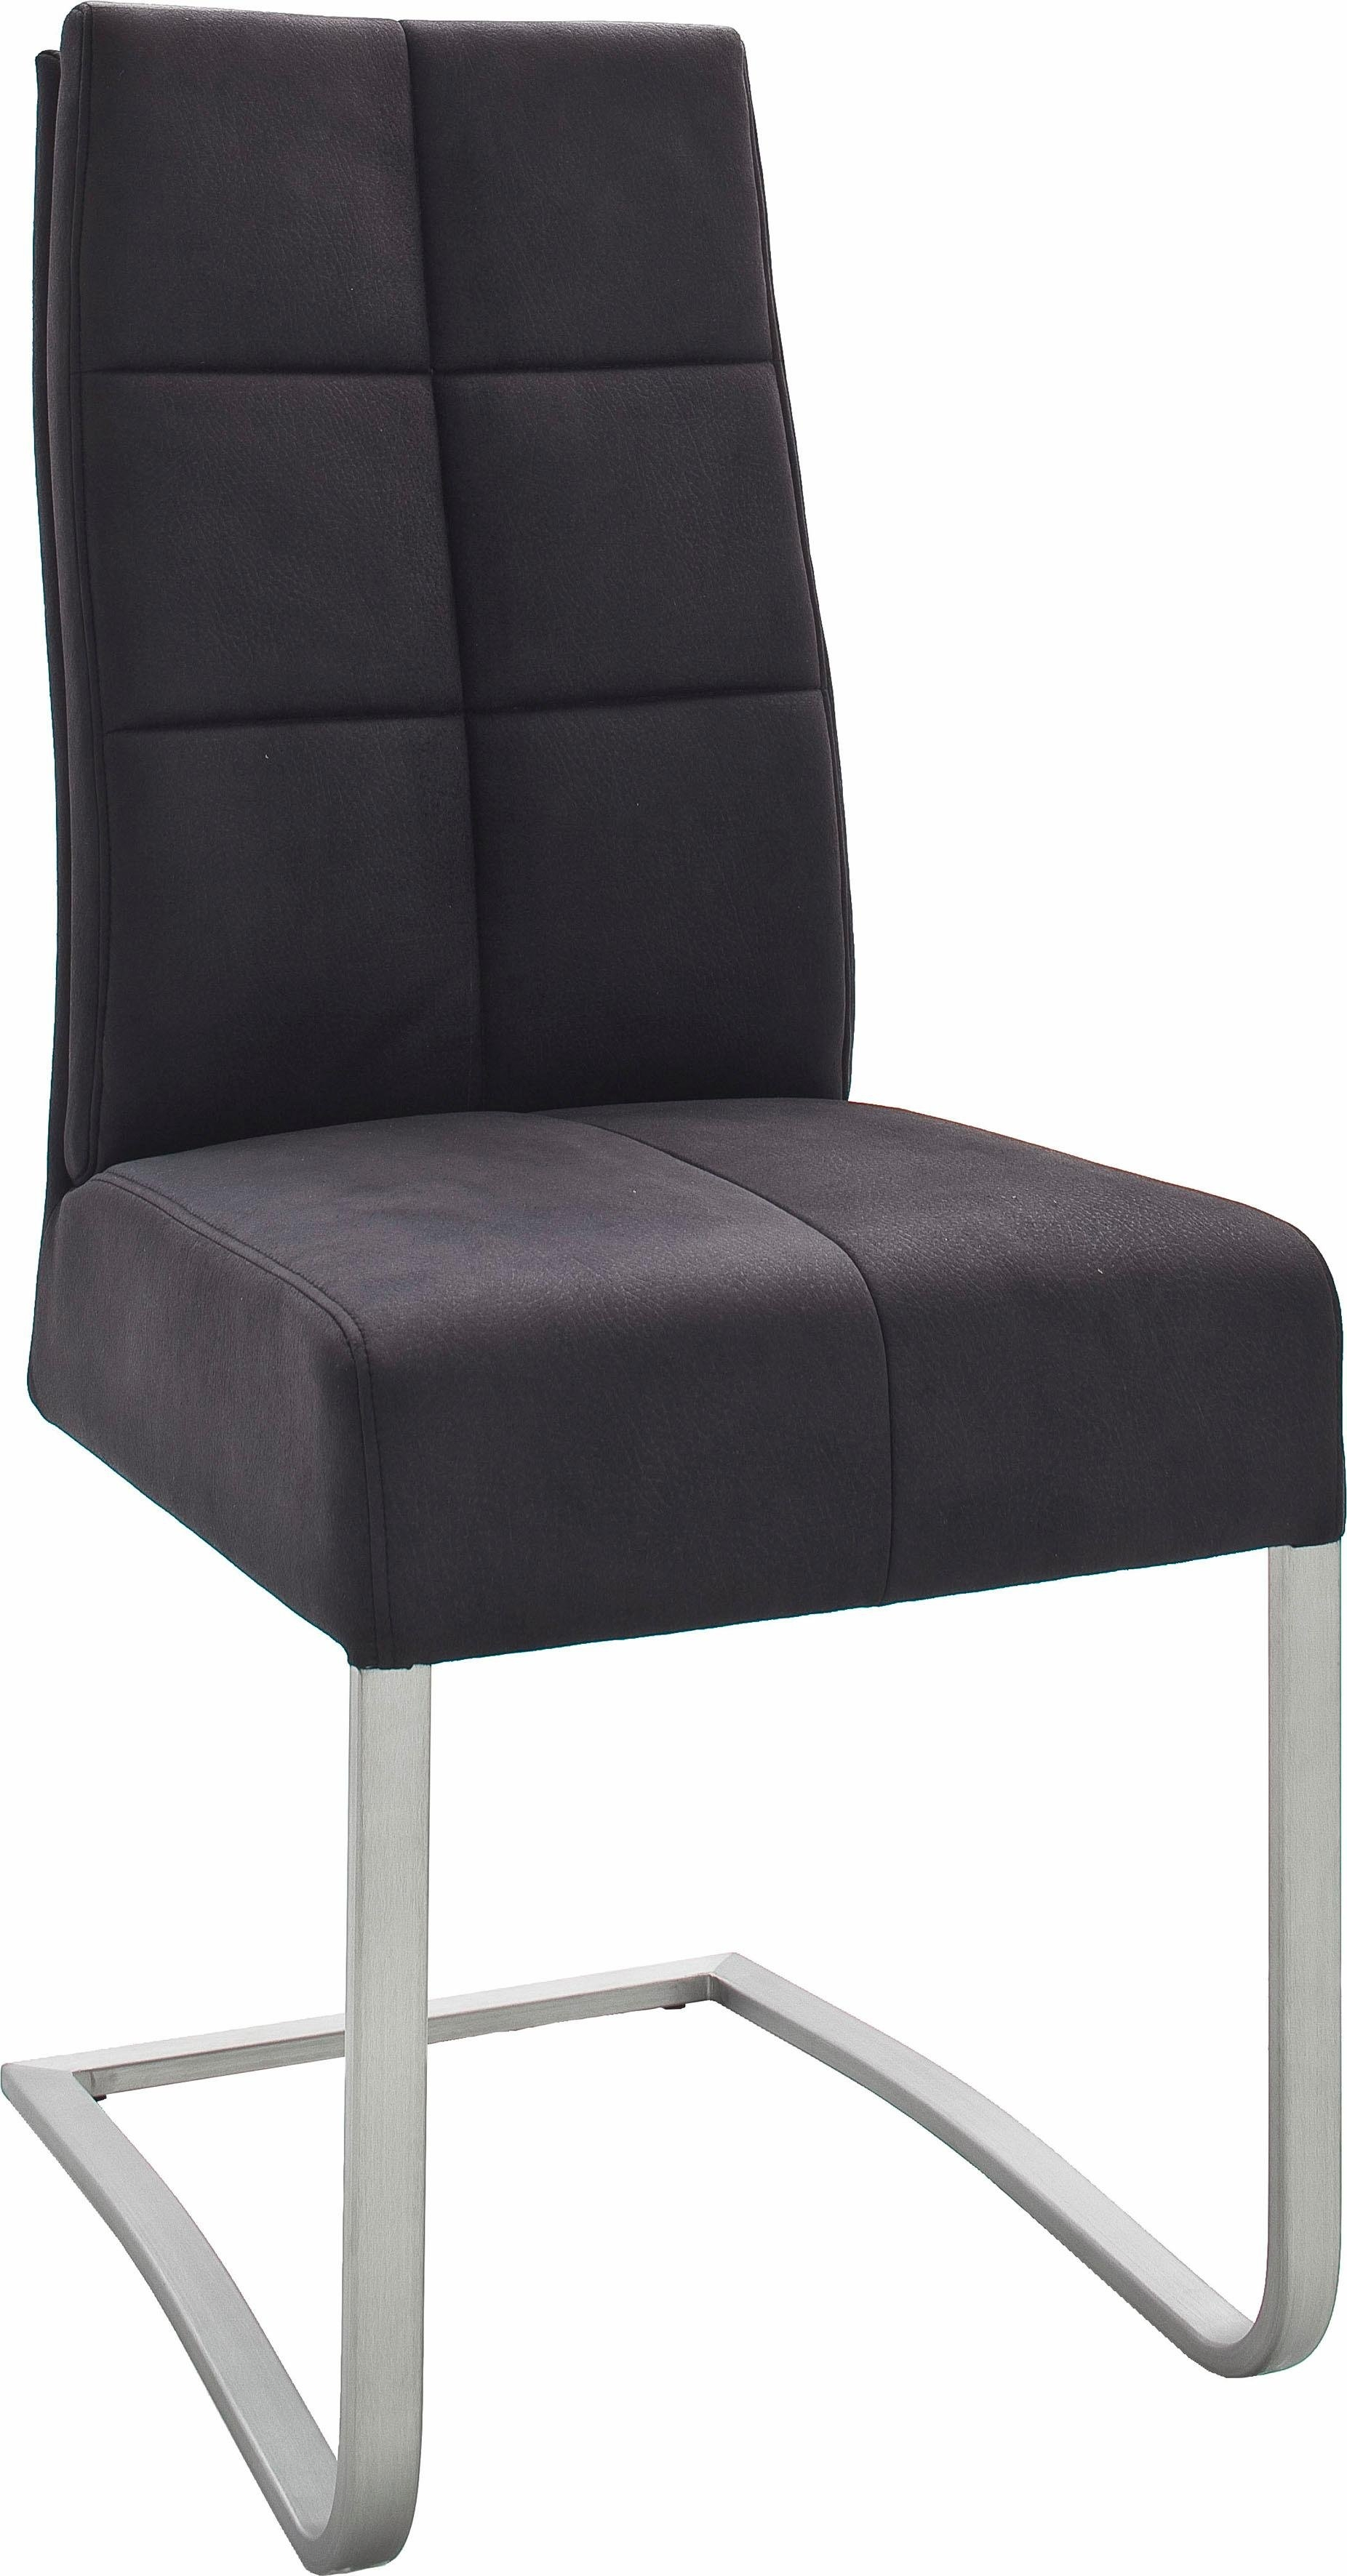 MCA furniture Eetkamerstoel Salva sledestoel met pocketvering, belastbaar tot max. 120 kg (set, 2 stuks) goedkoop op otto.nl kopen